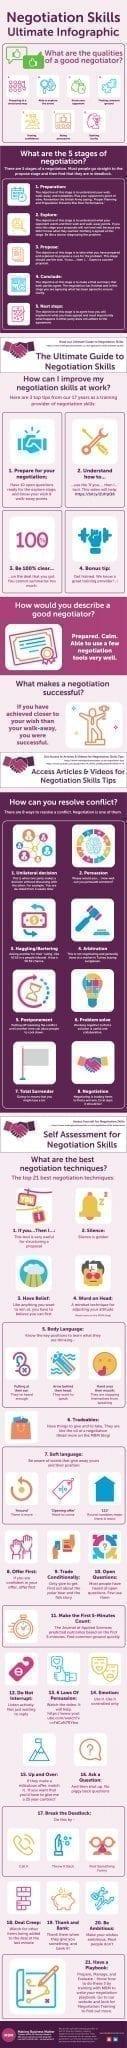 Negotiation Skills Infographic